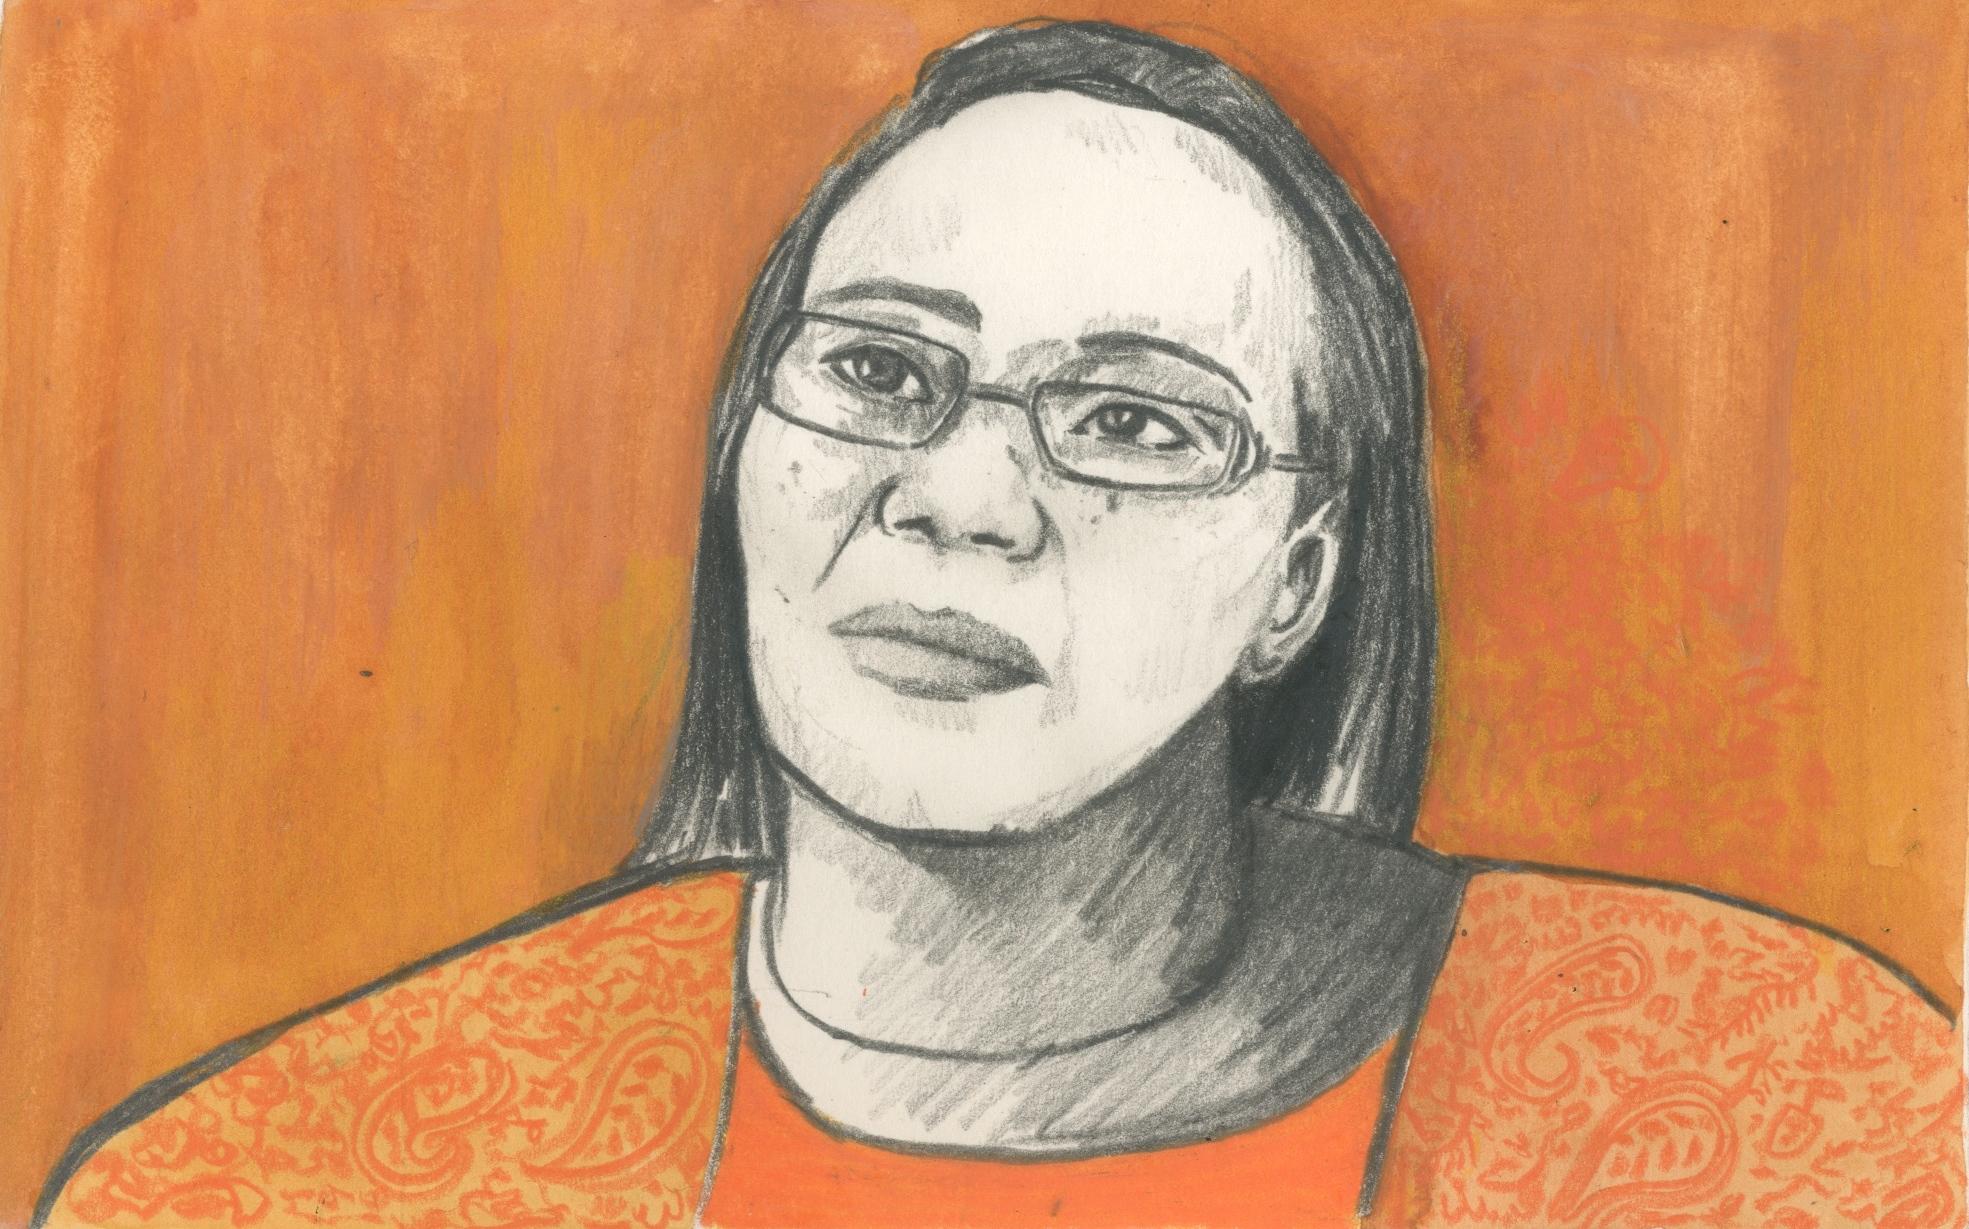 06/01/15 Fatoumata Nafo-Traore, Head of the UN's Roll Back Malaria Partnership